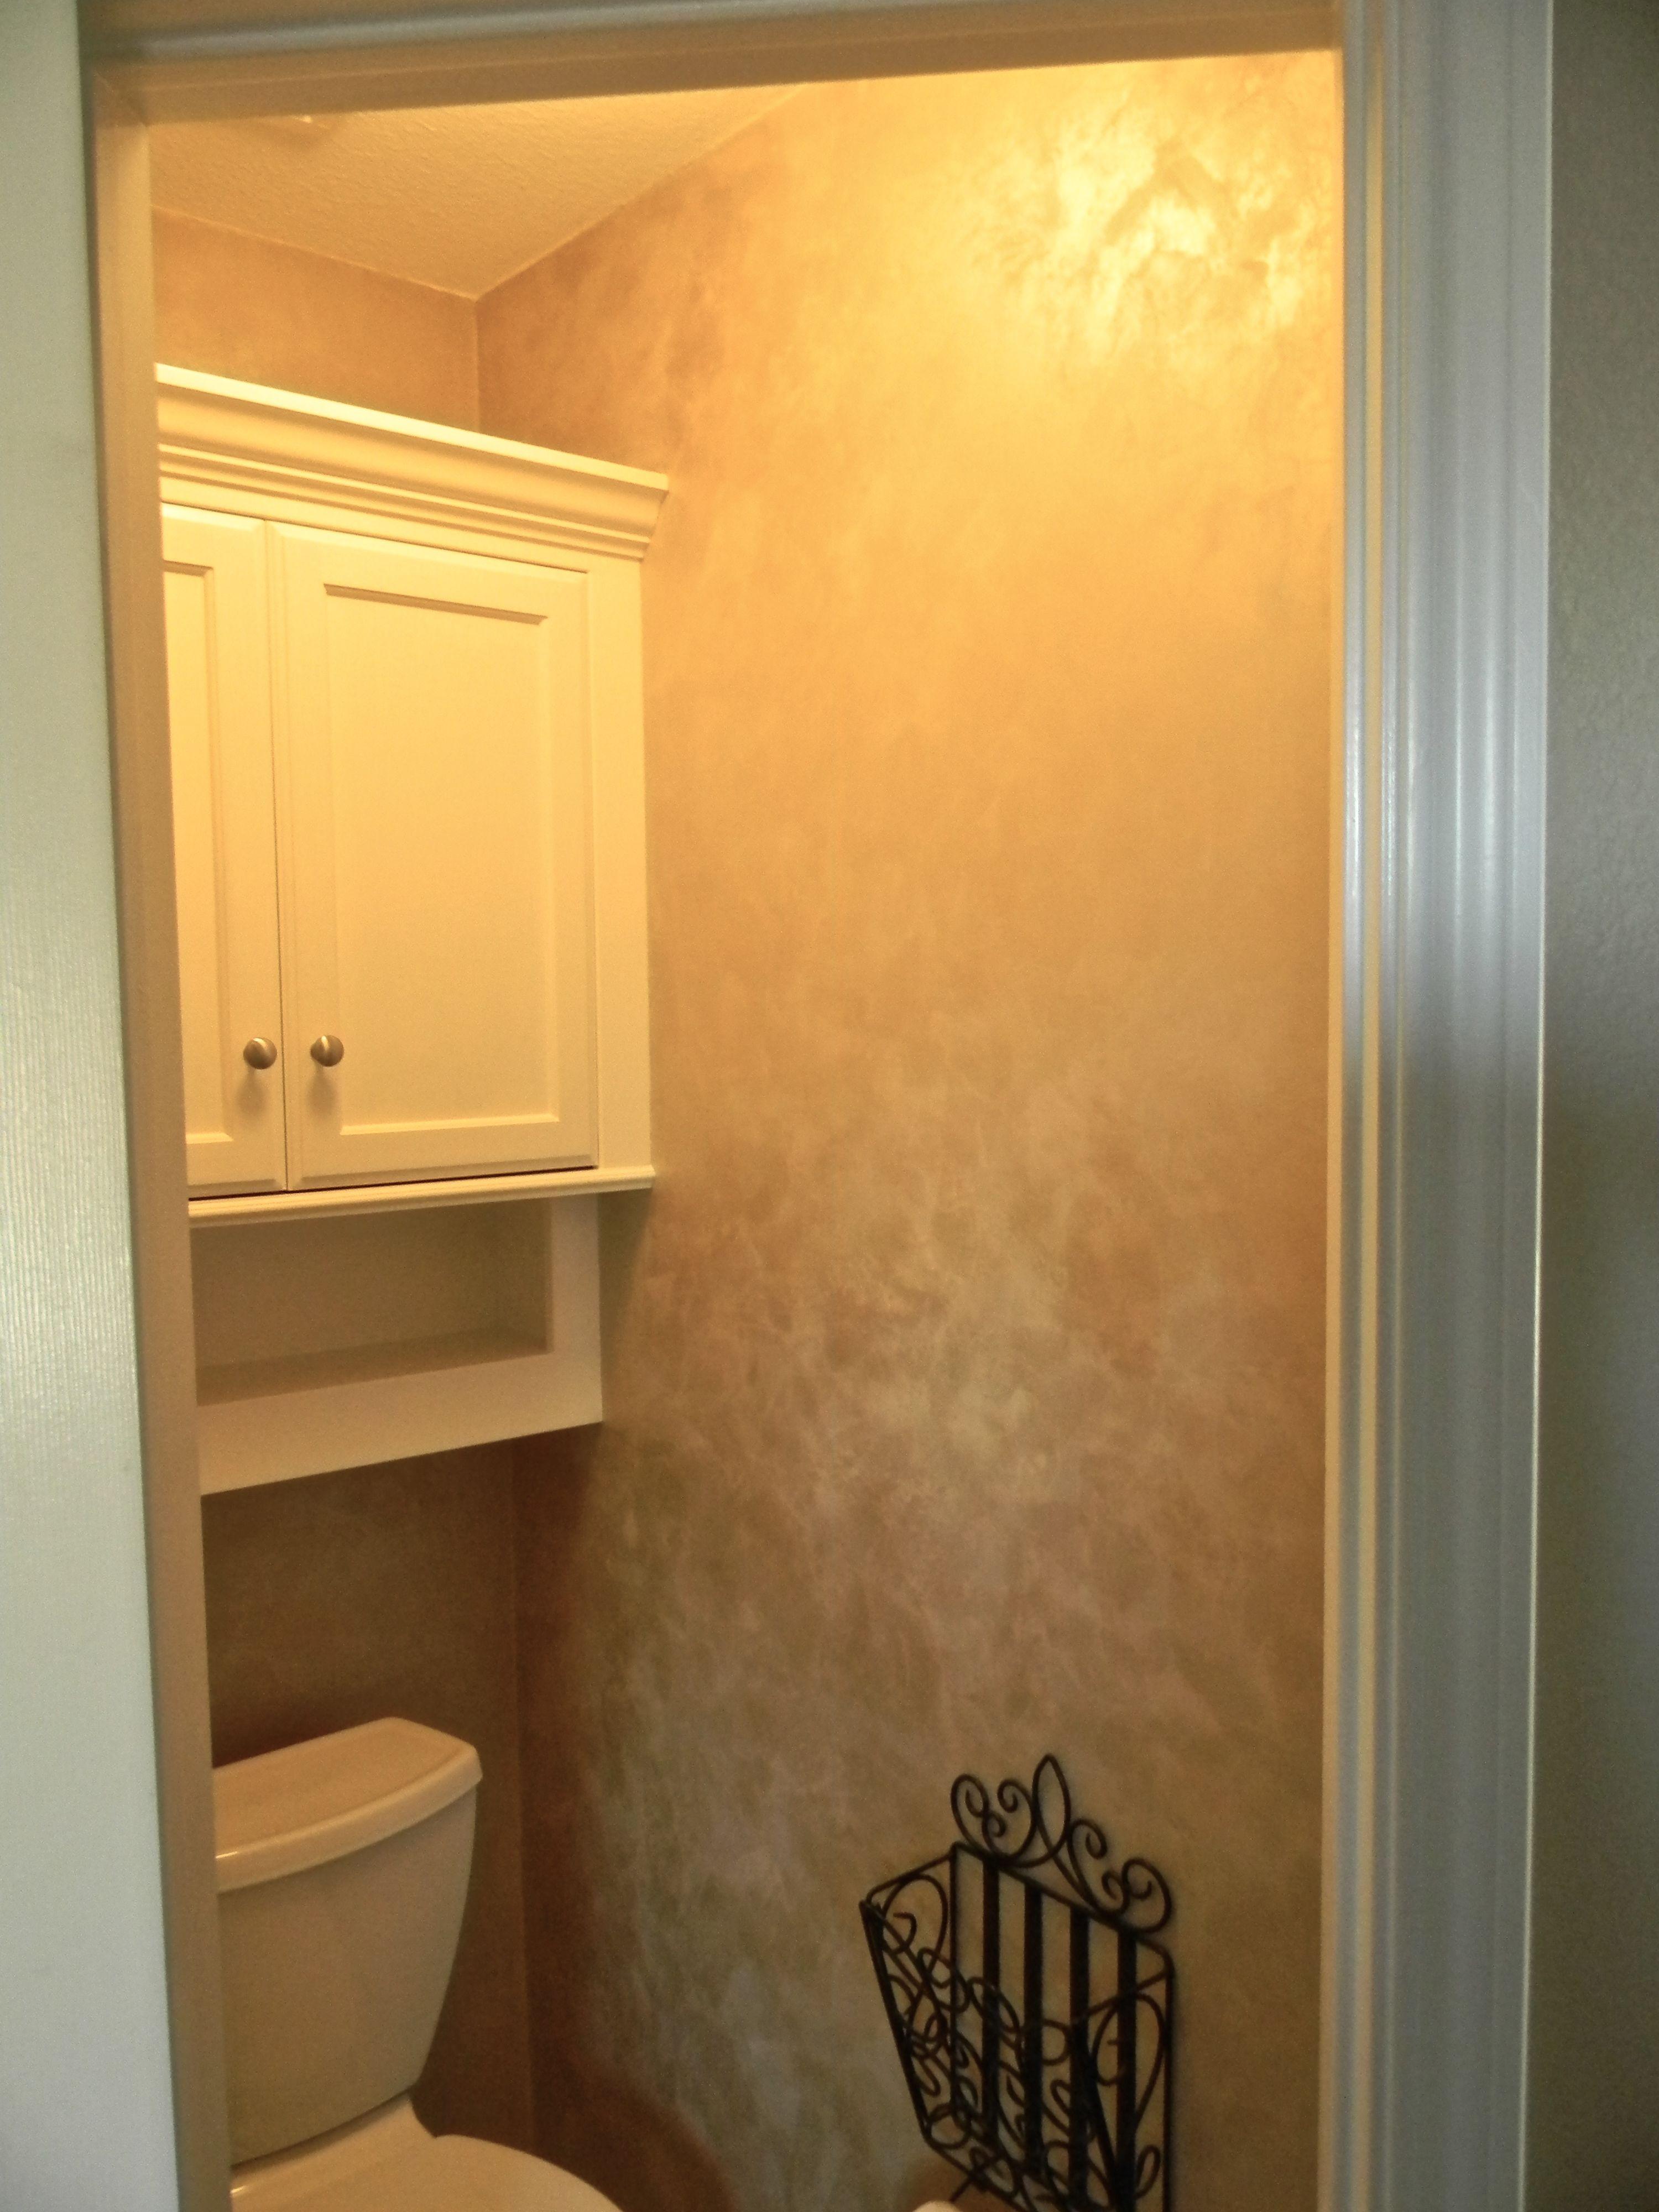 Gold decorative plaster | Murals and Artwork | Pinterest ...